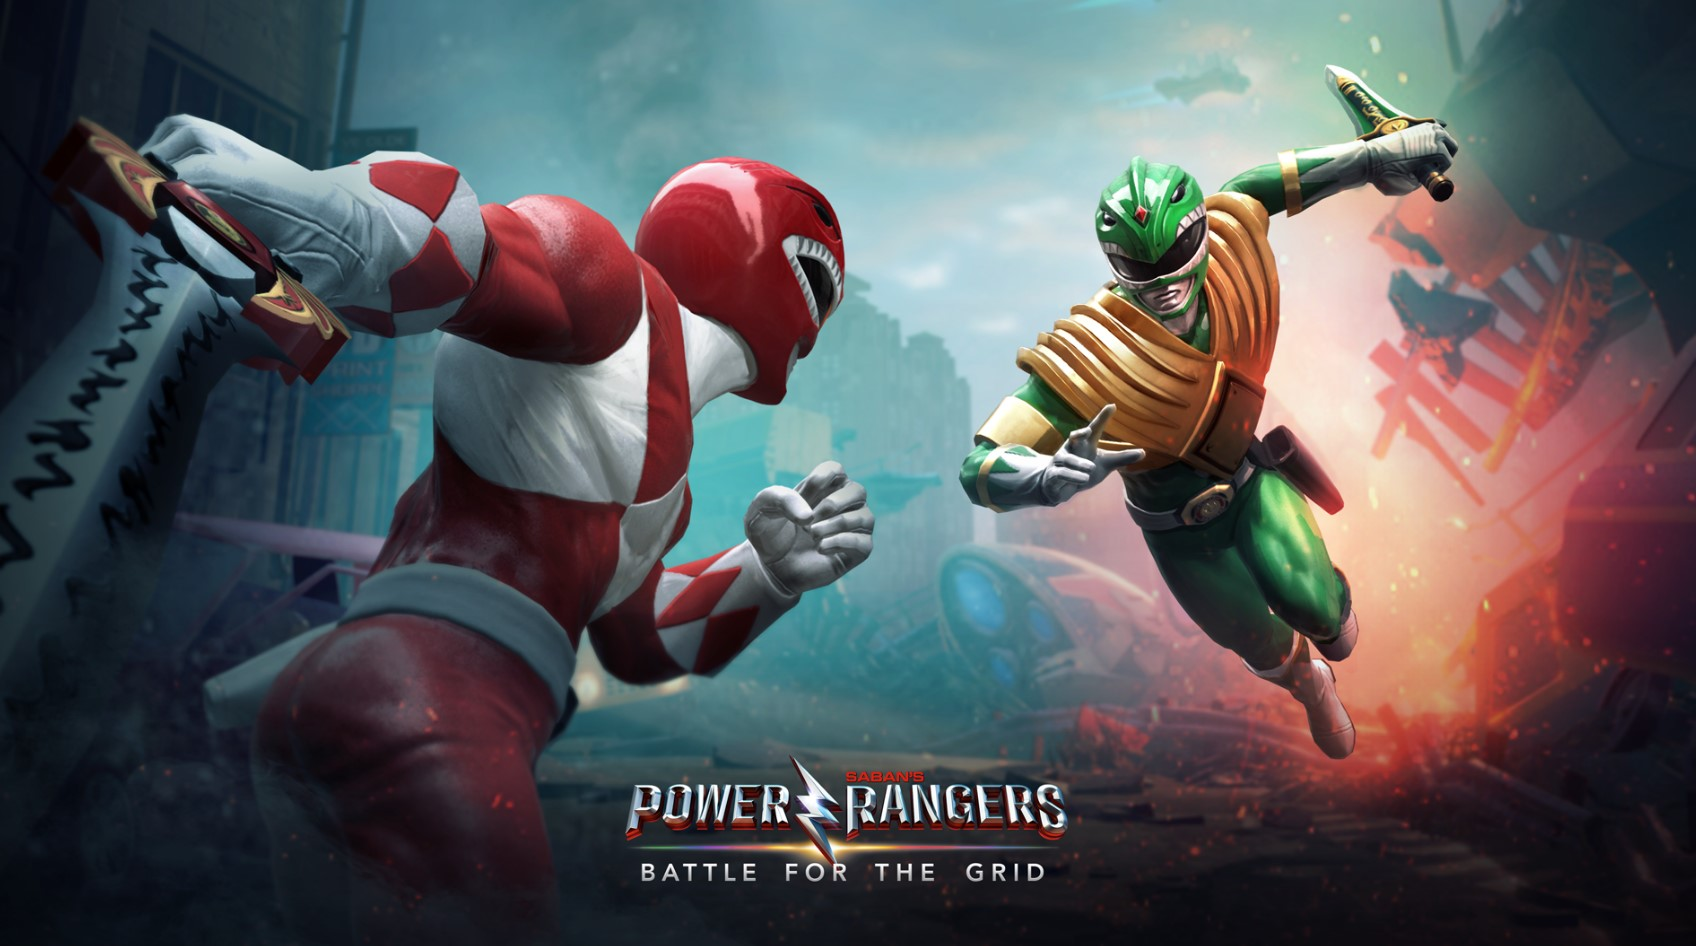 Power Rangers Video Game